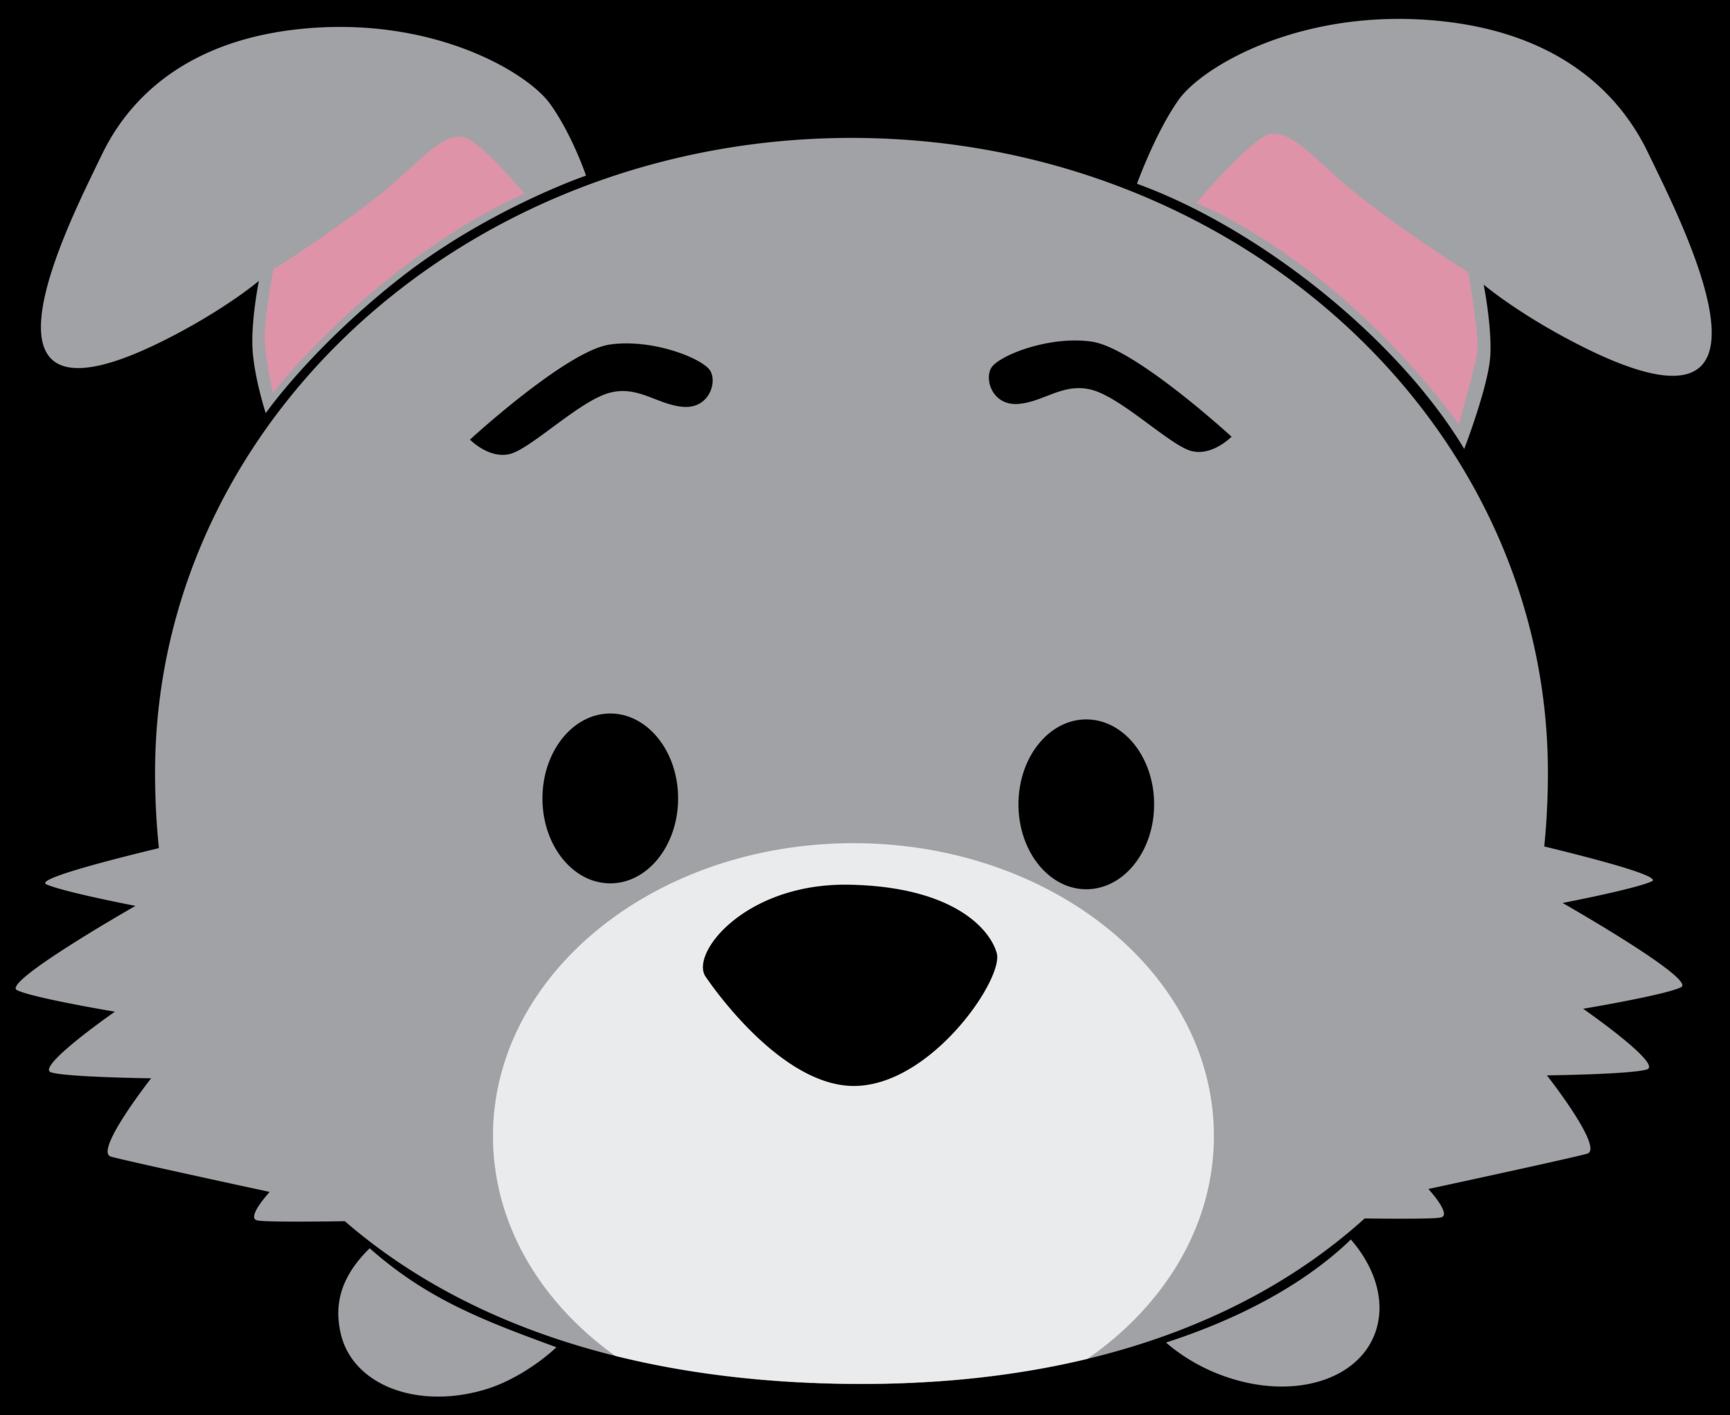 Disney Tsum Tsum Clipart 9: Disney Tsum Tsum Clipart 21